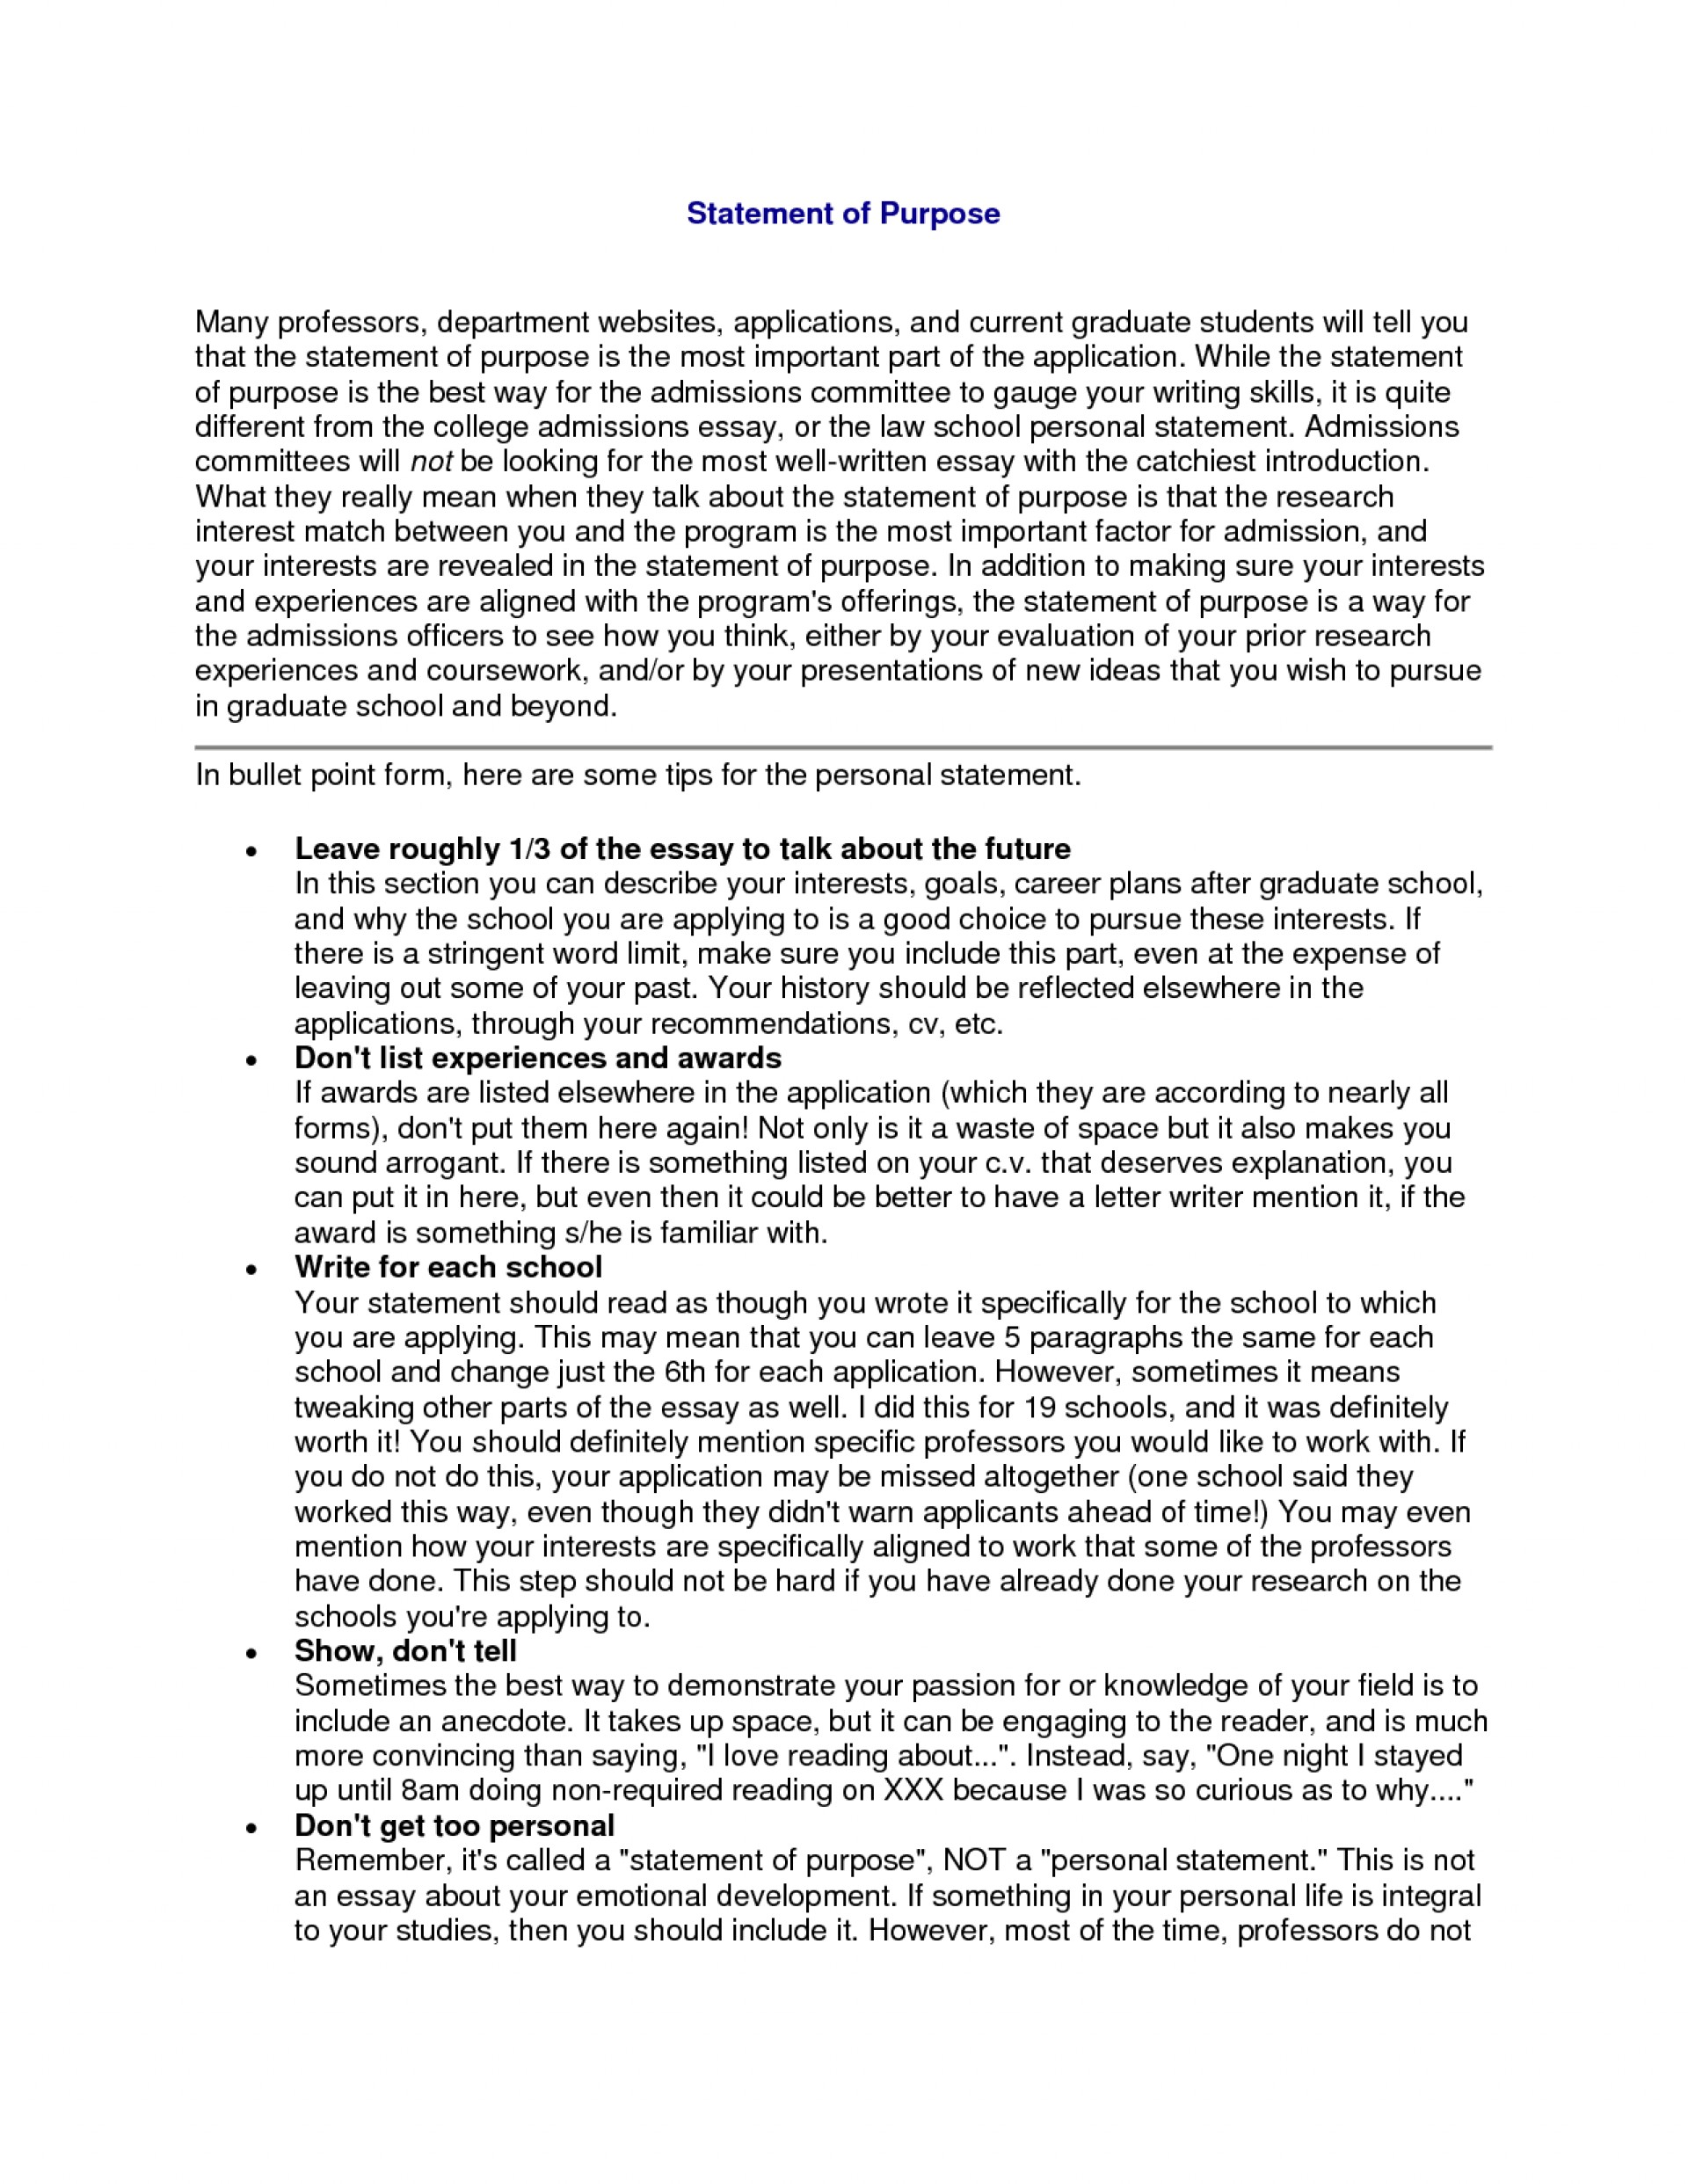 003 Essay Example Graduate School Statement Of Purpose Scvjvatw Sample Top Essays Examples Mba Nursing 1920